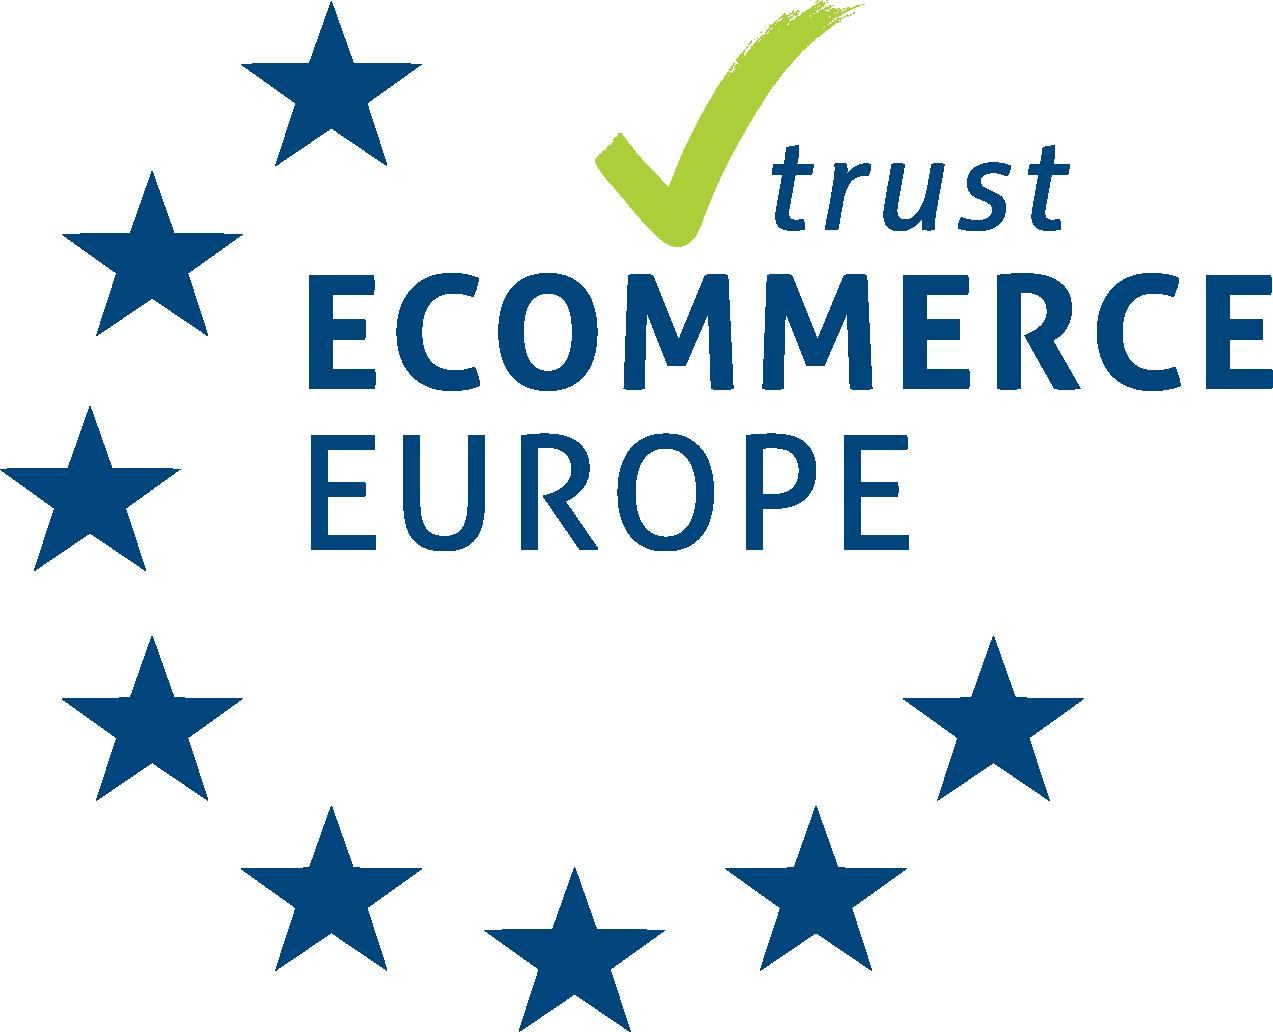 Trust Ecommerce Europe